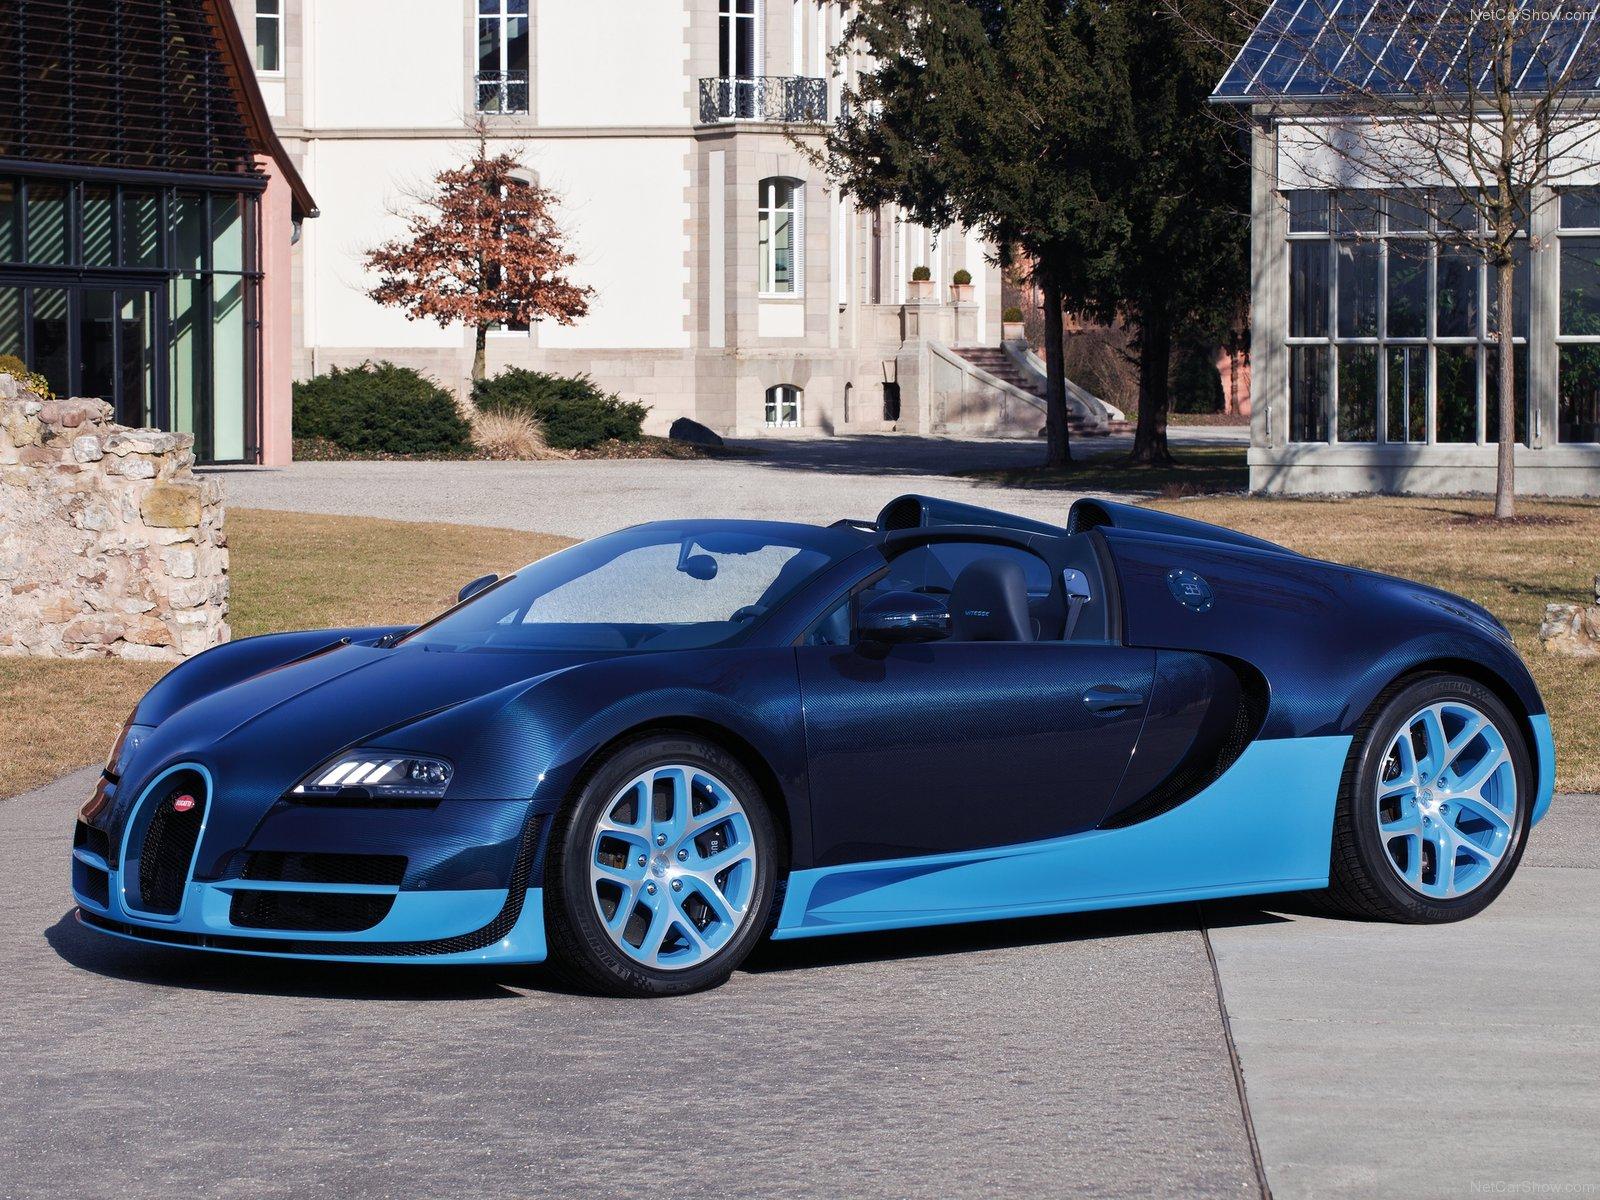 2012%2BBugatti%2BVeyron%2BGrand%2BSport%2BVitesse%2B%25281%2529 Astounding Xe Bugatti Veyron Grand Sport Vitesse Cars Trend